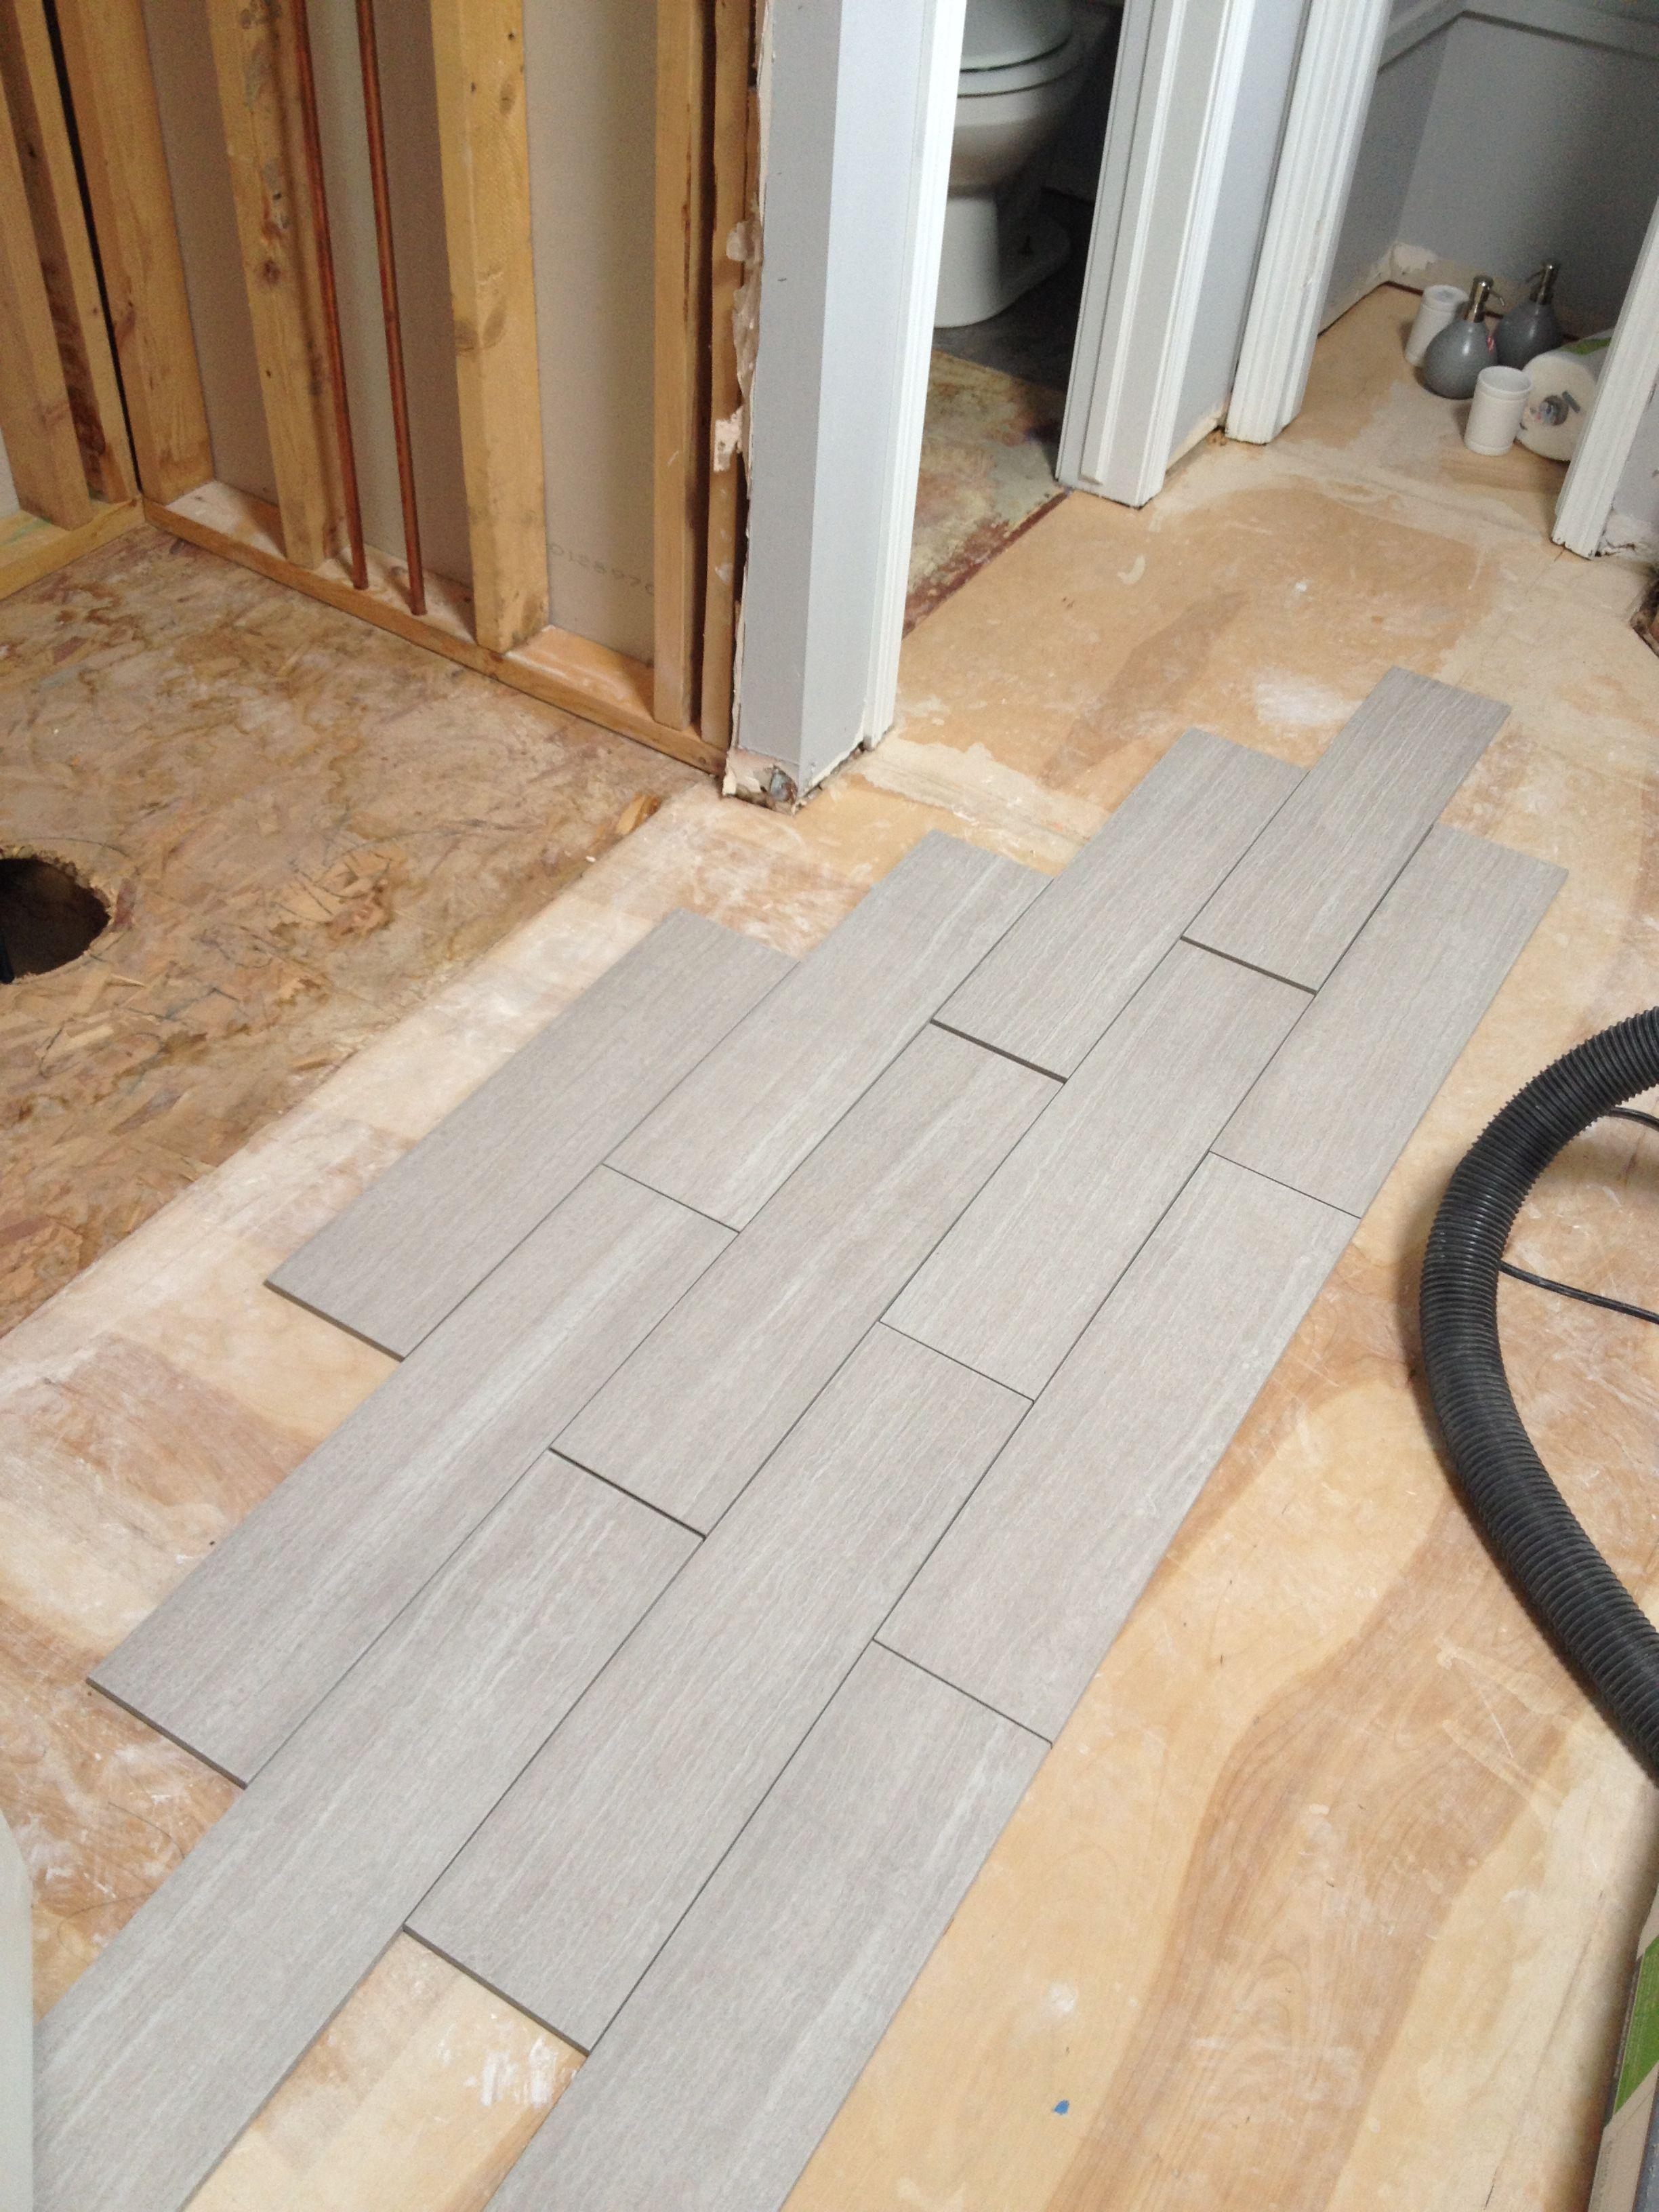 Light gray floor tile Gray tile bathroom floor, Bathroom